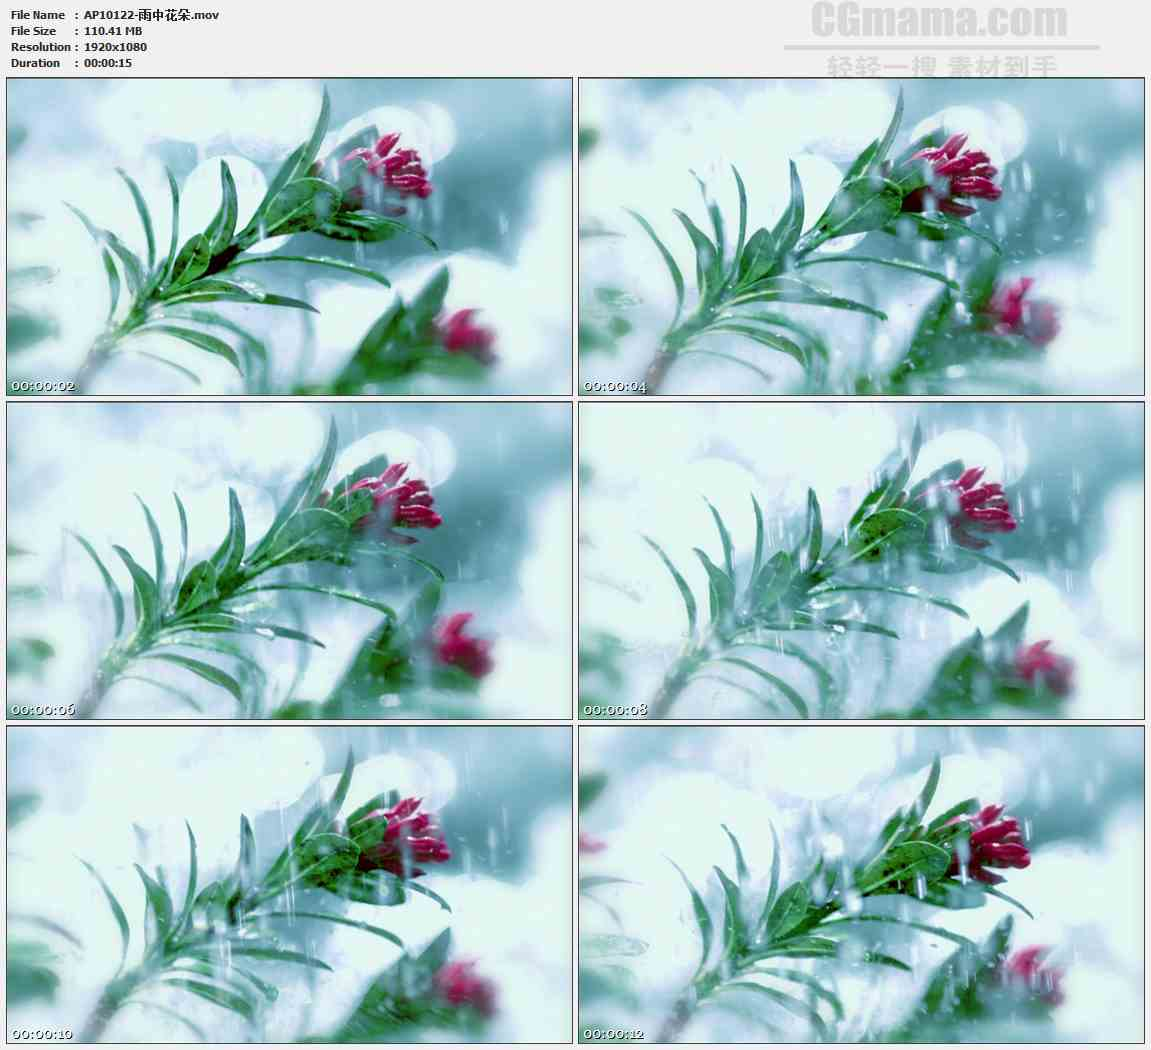 AP10122-雨水拍打花朵高清实拍视频素材